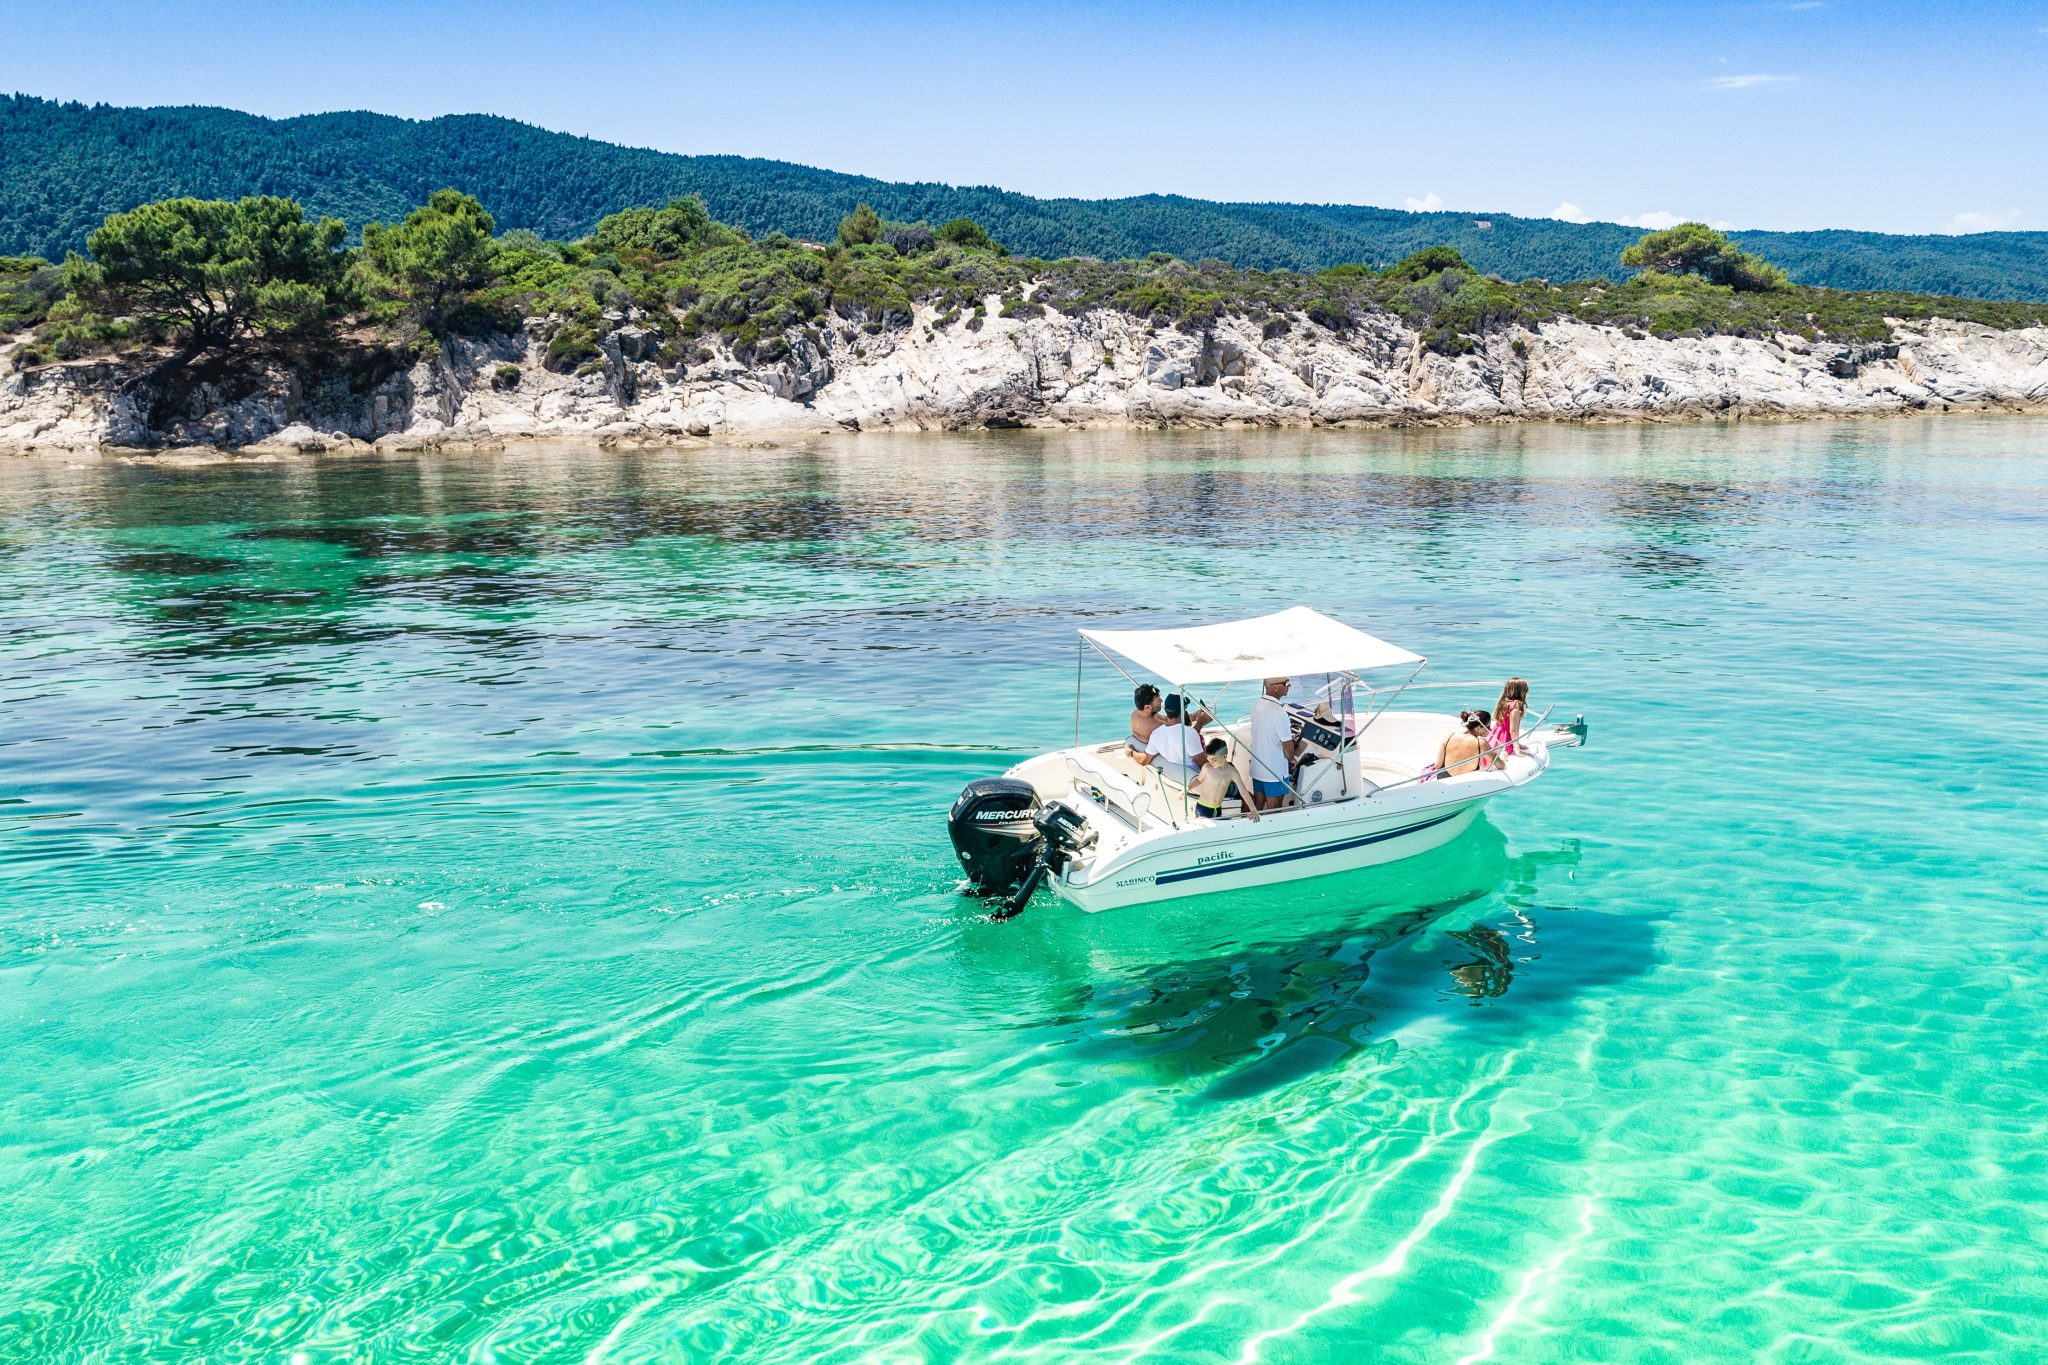 POSEIDON rent a boat